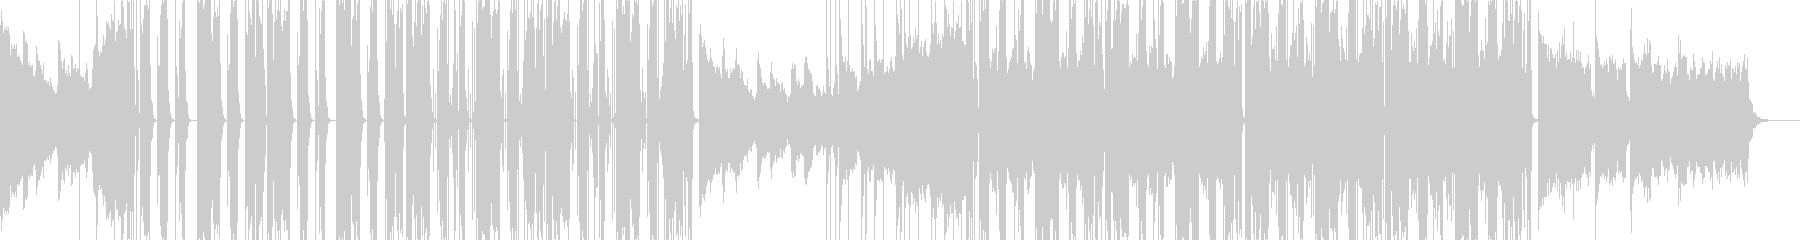 Futubass01V1の未再生の波形